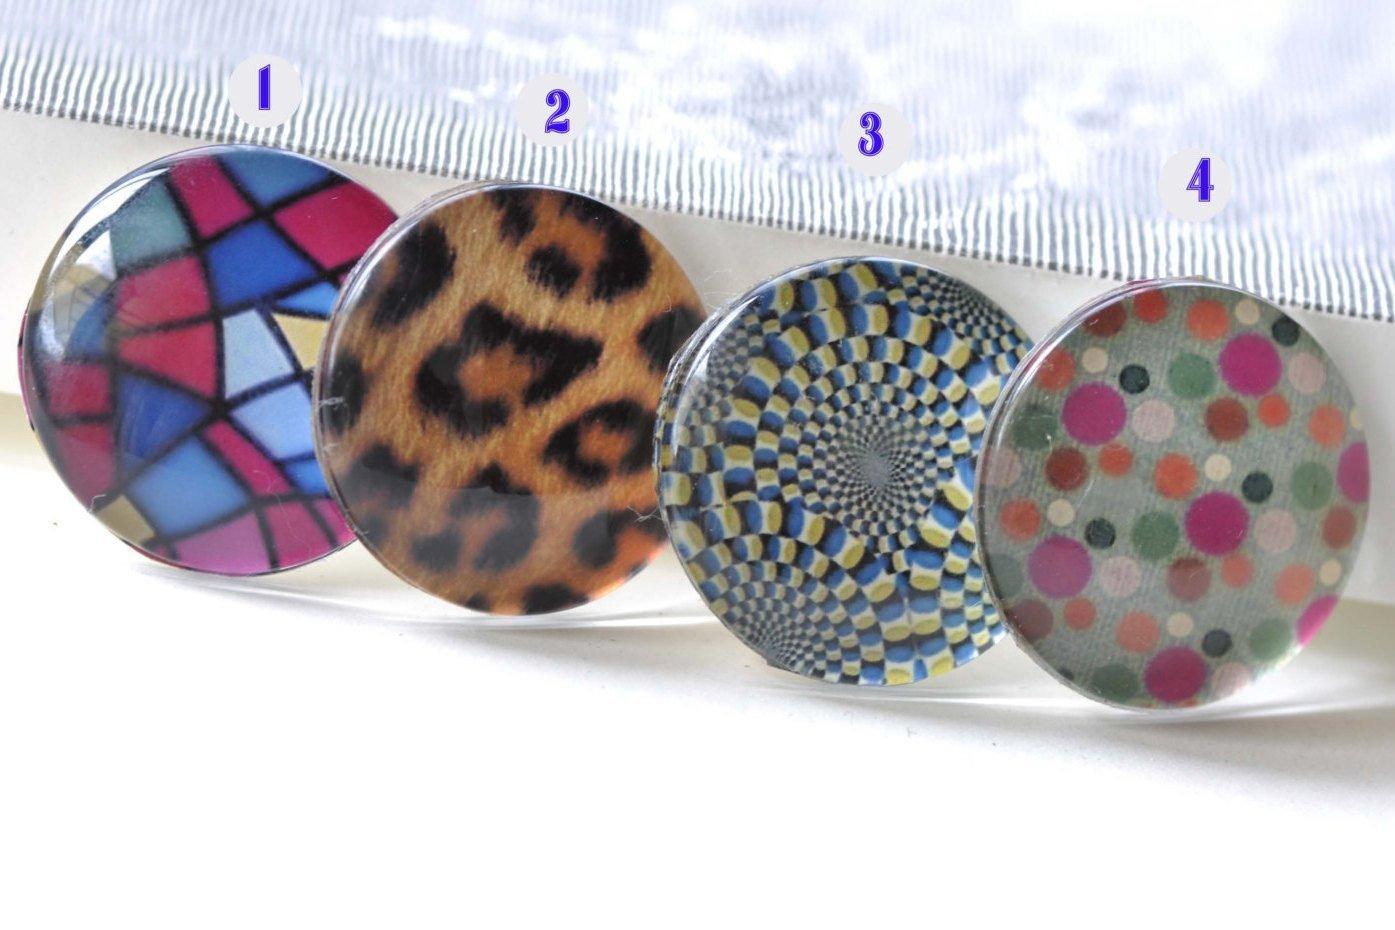 Abstract Geometric Pattern Photo Glass Cabochon Dome Cameo 25mm 5 pcs No.3  A8194